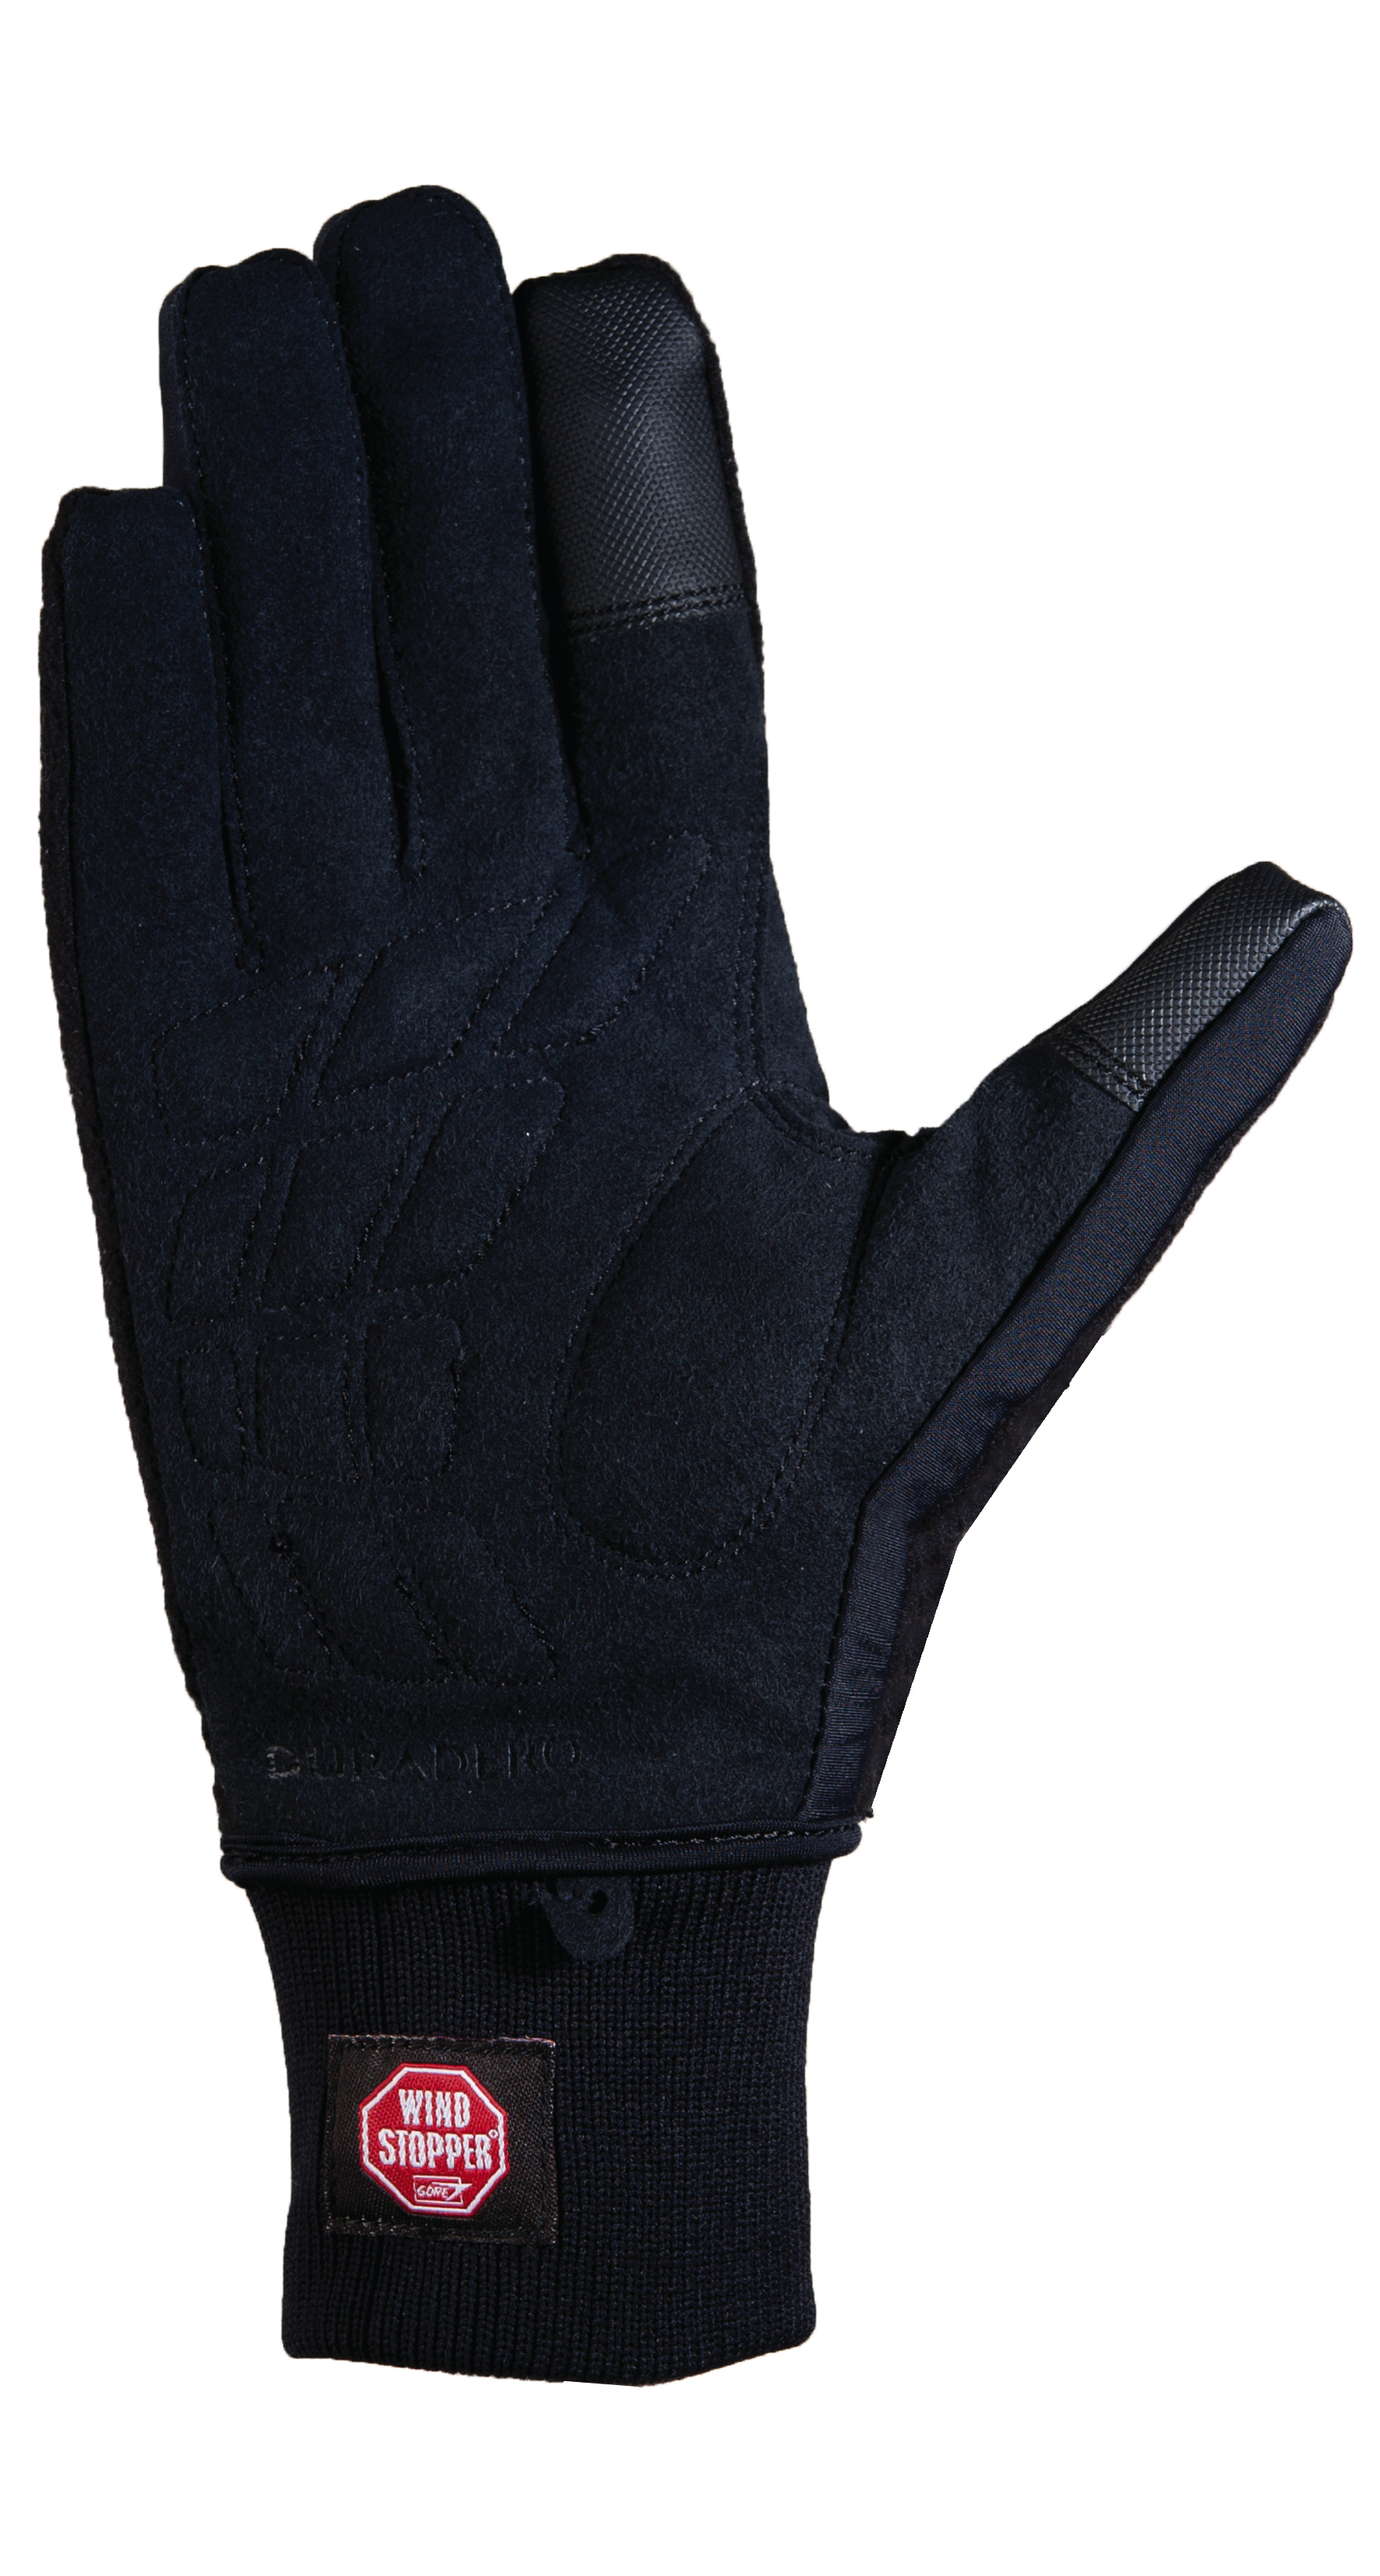 103102bc9a3b54 Roeckl Rosario Jr Kinder Winter Fahrrad Handschuhe lang schwarz/rot ...